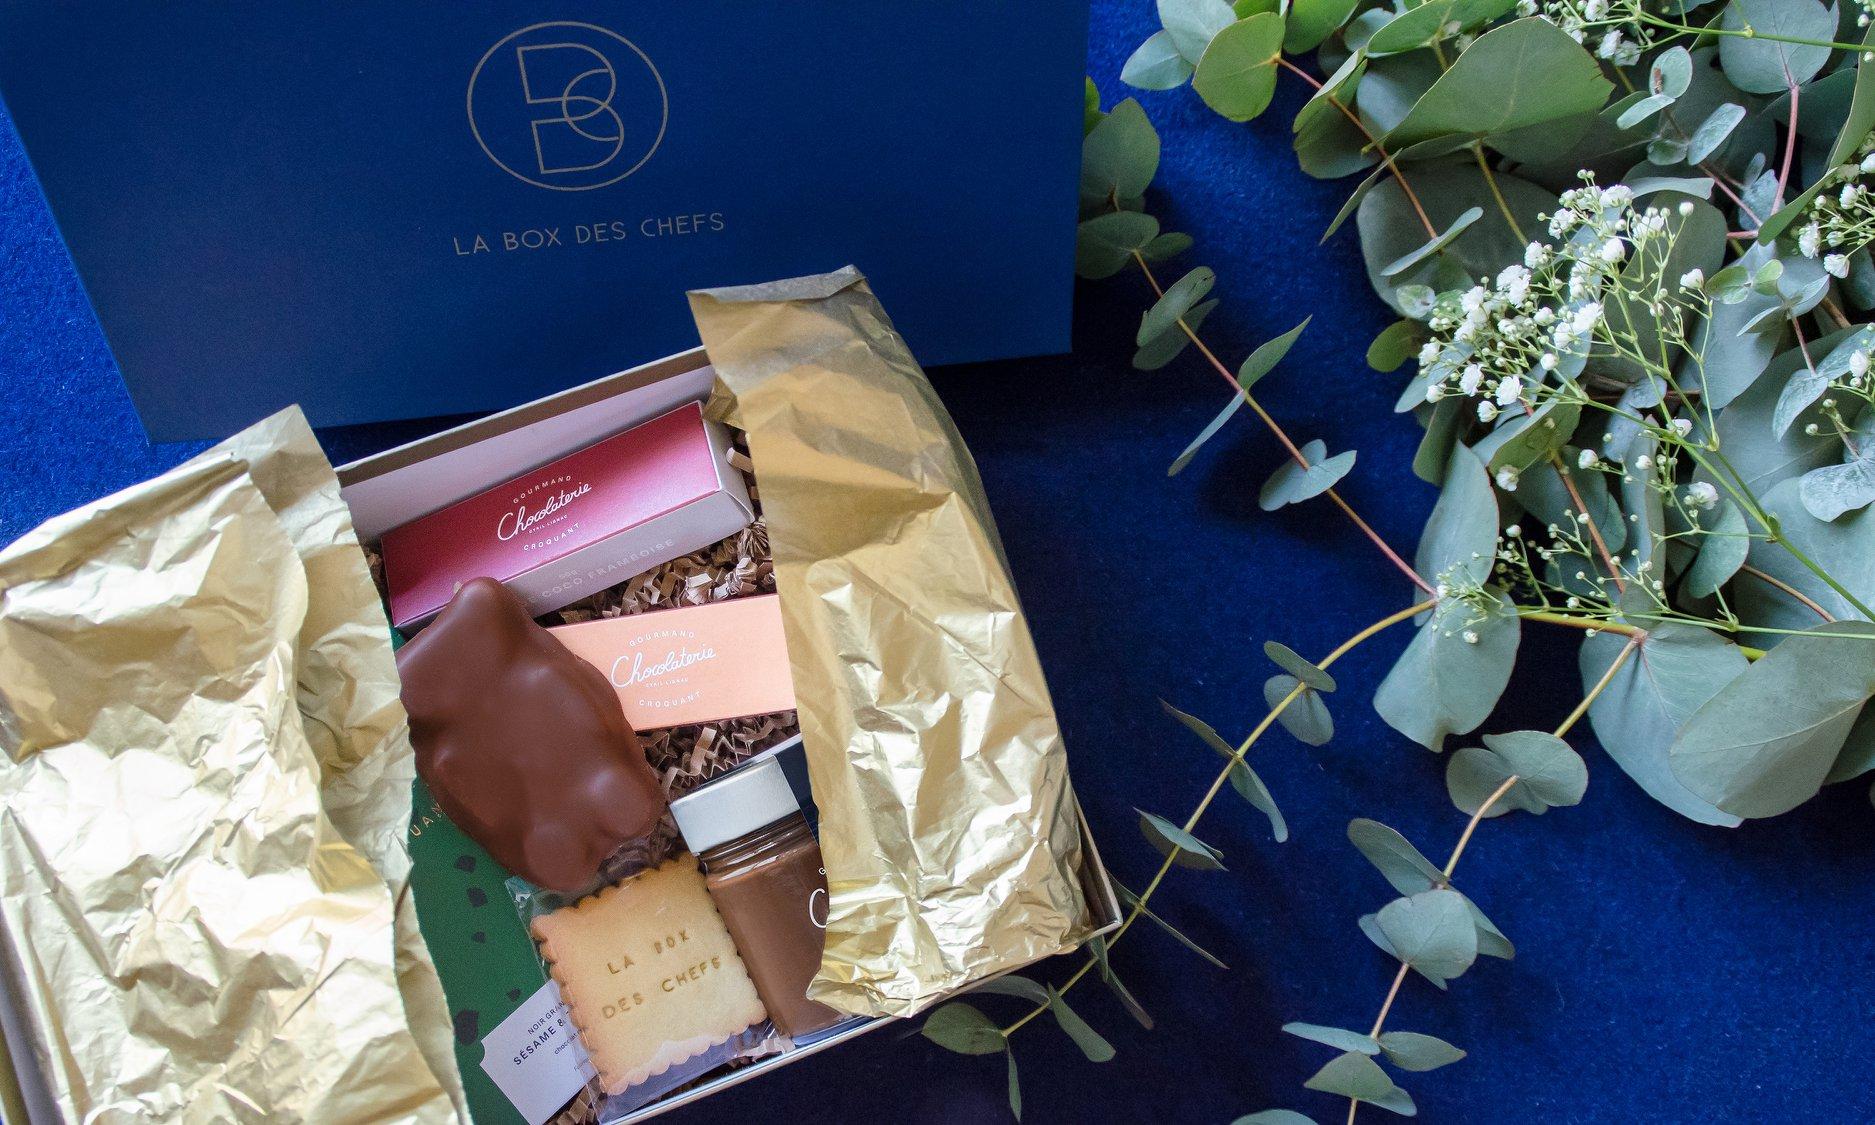 la-box-des-chefs-cyril-lignac